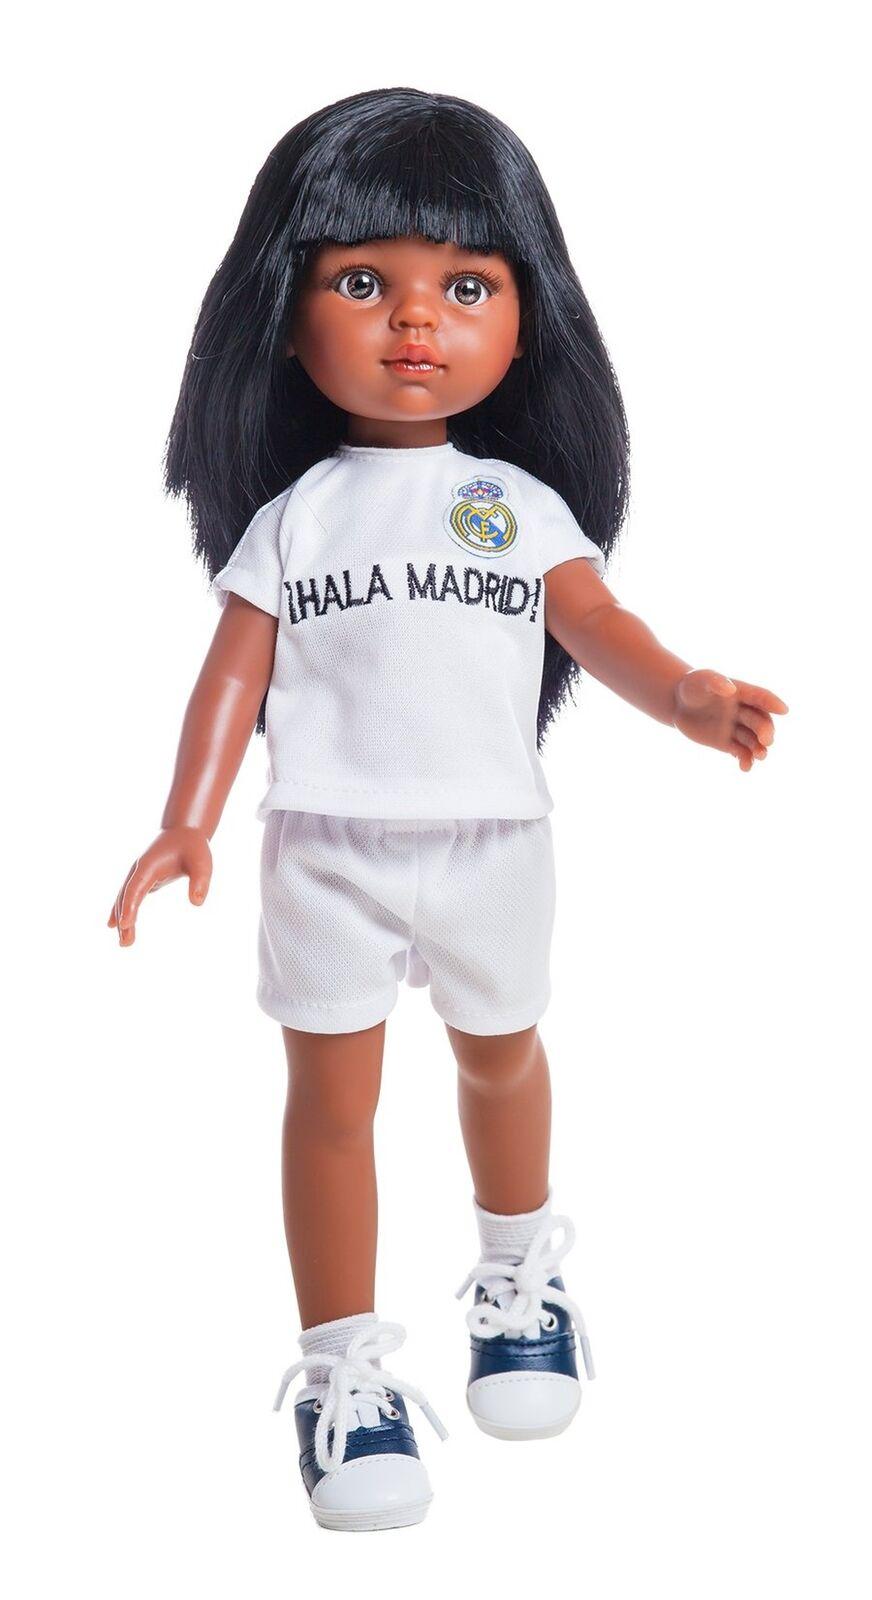 Paola Reina 32 cm Nora Nora Nora Amiga Real Madrid Doll b3fb6a